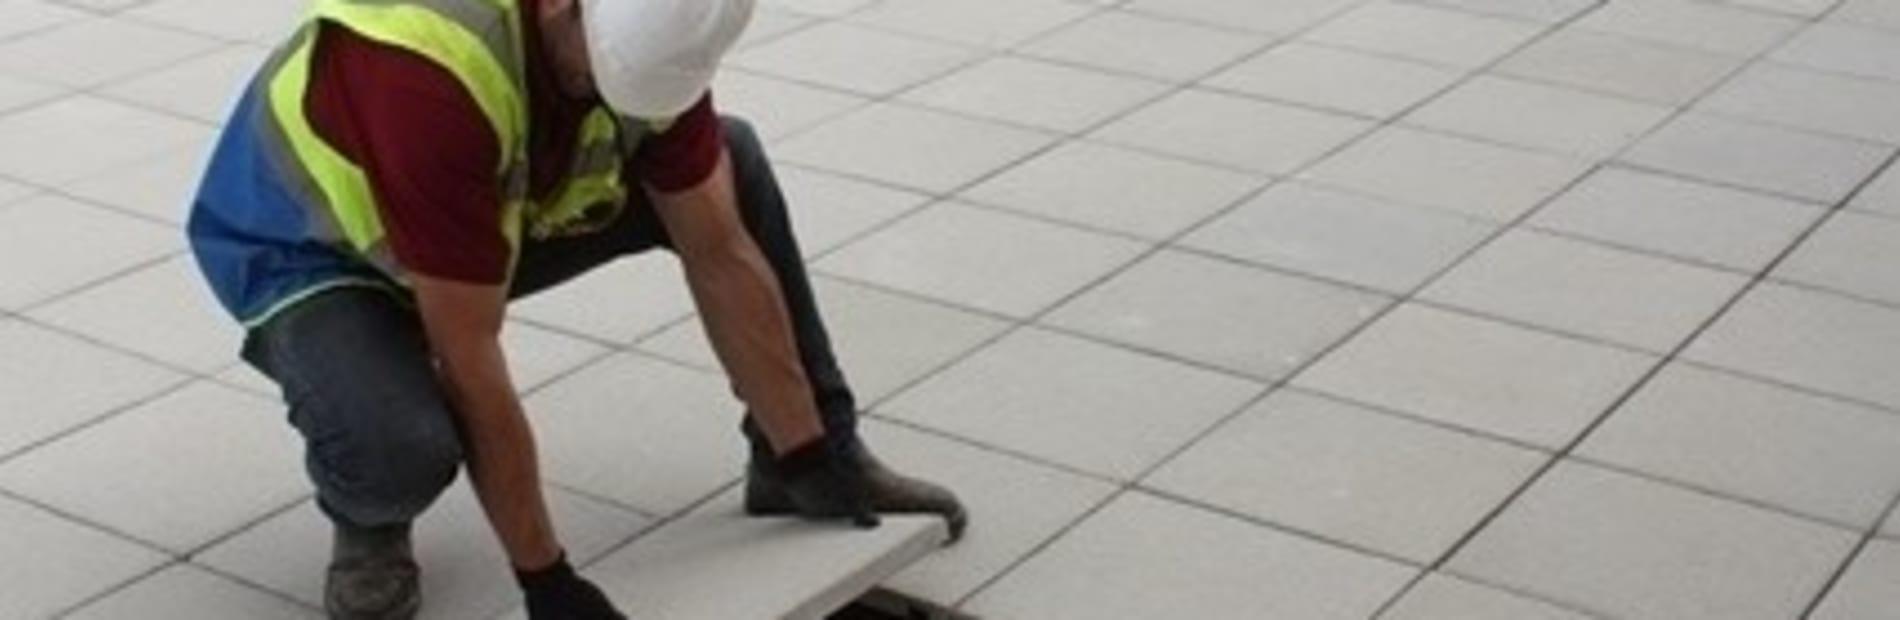 Pedestal Accessories hero image